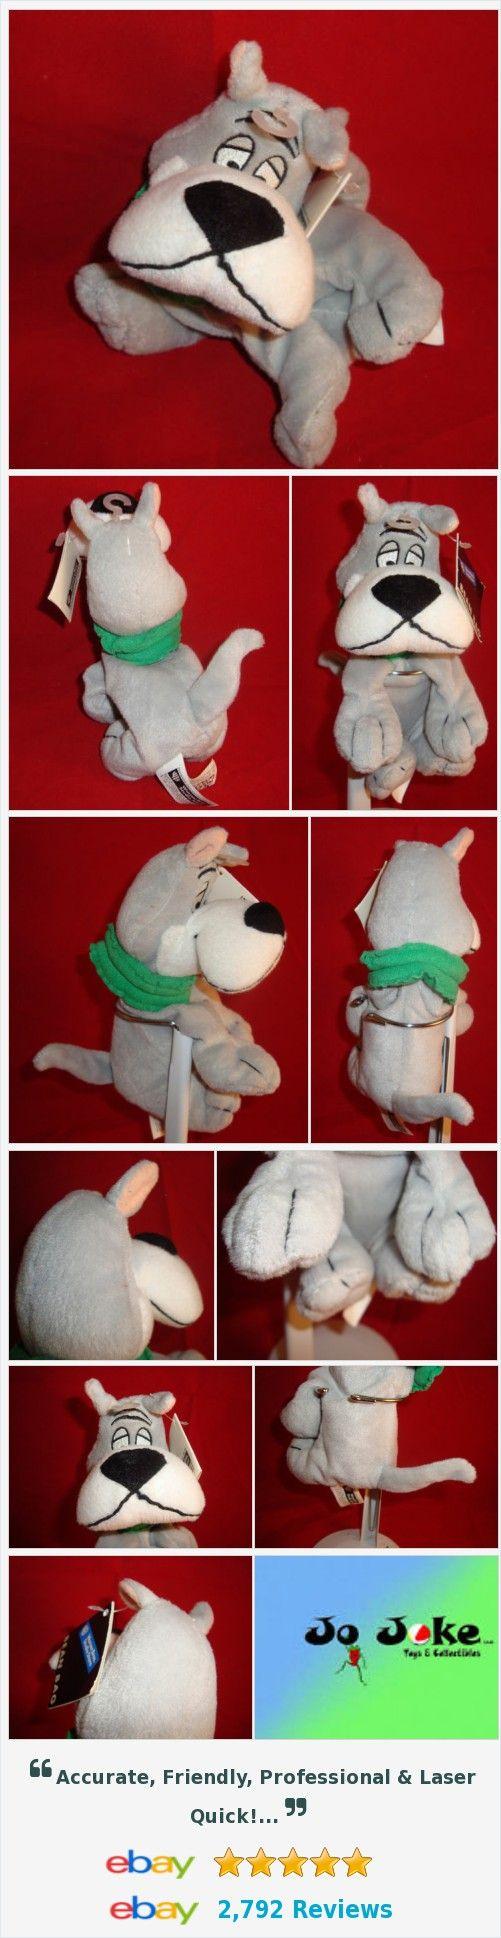 "WARNER BROS STUDIO STORE-THE JETSON'S DOG-ASTRO-BEAN PLUSH-8""-NEW/TAGS-RARE-COOL"